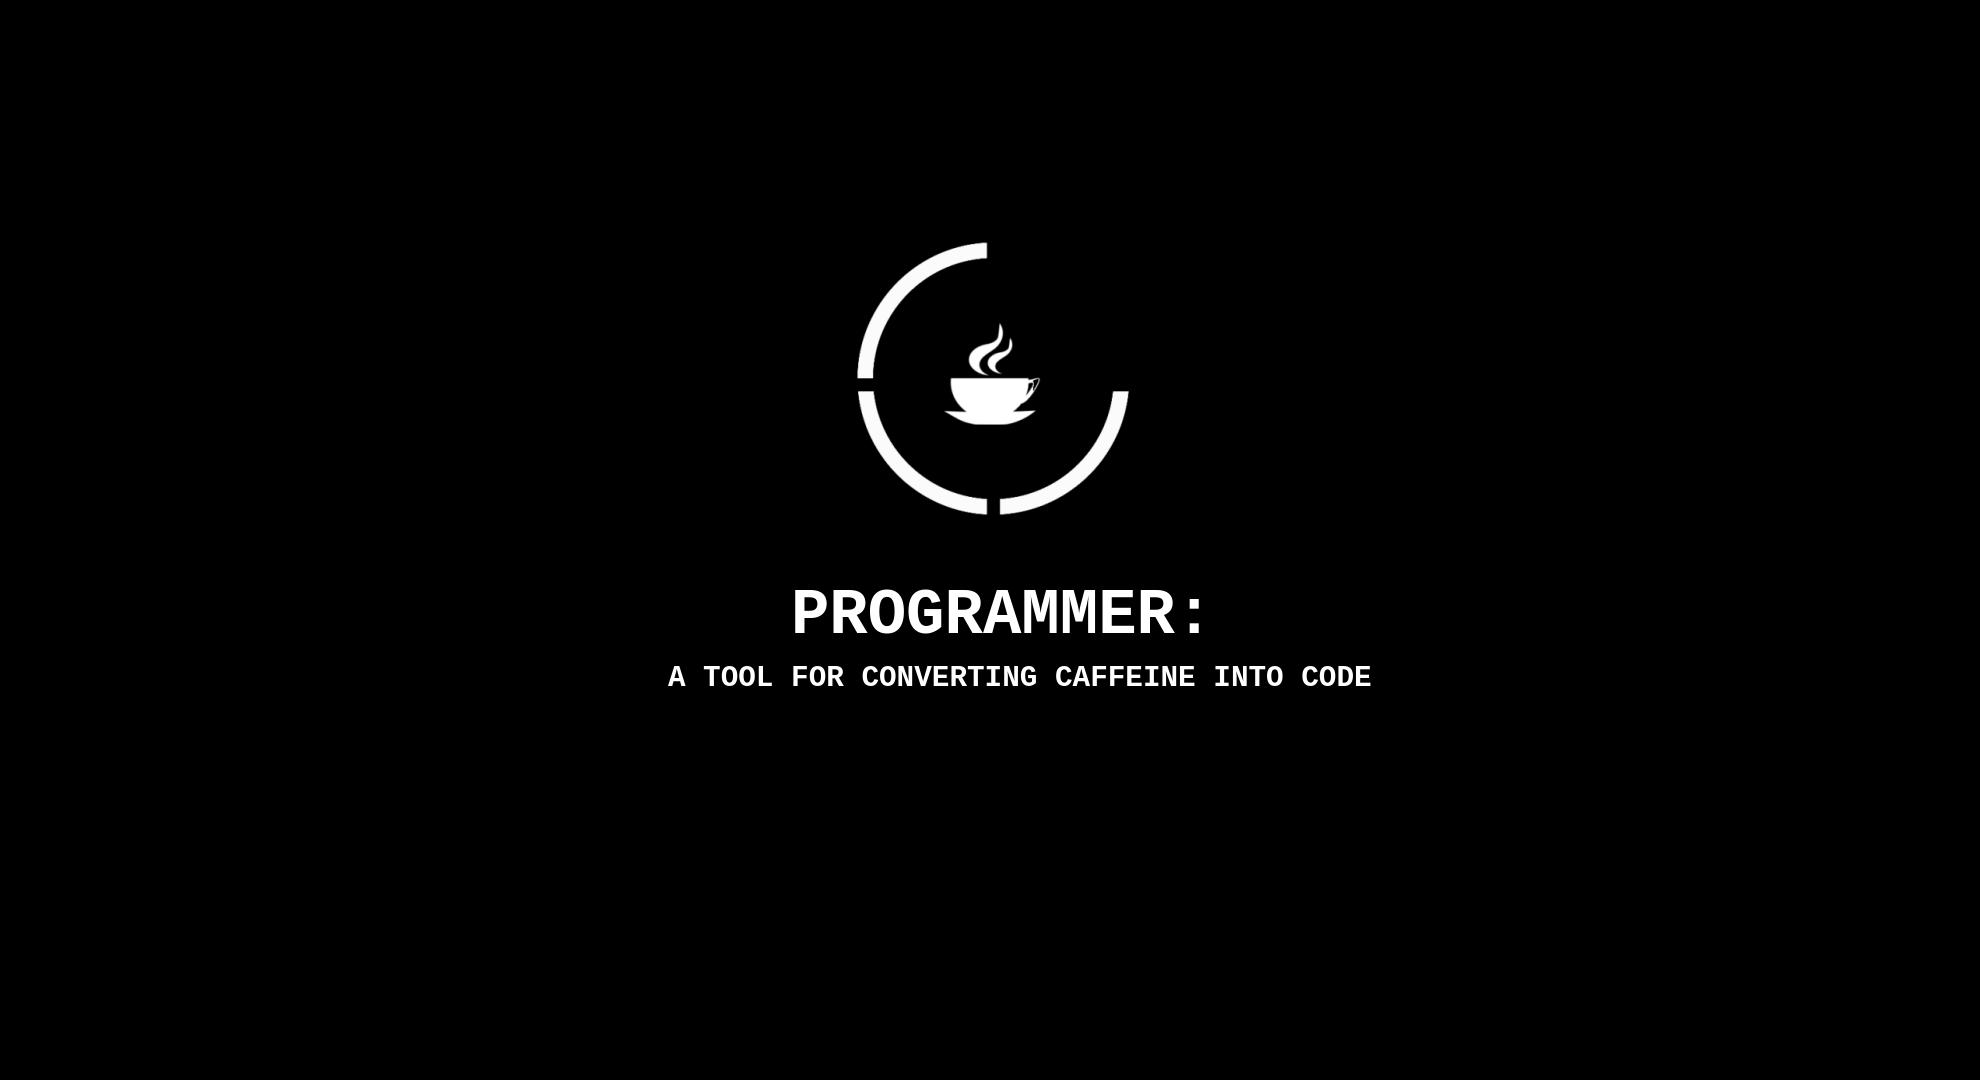 programmer Computer Wallpapers Desktop Backgrounds 1980x1080 ID 1980x1080